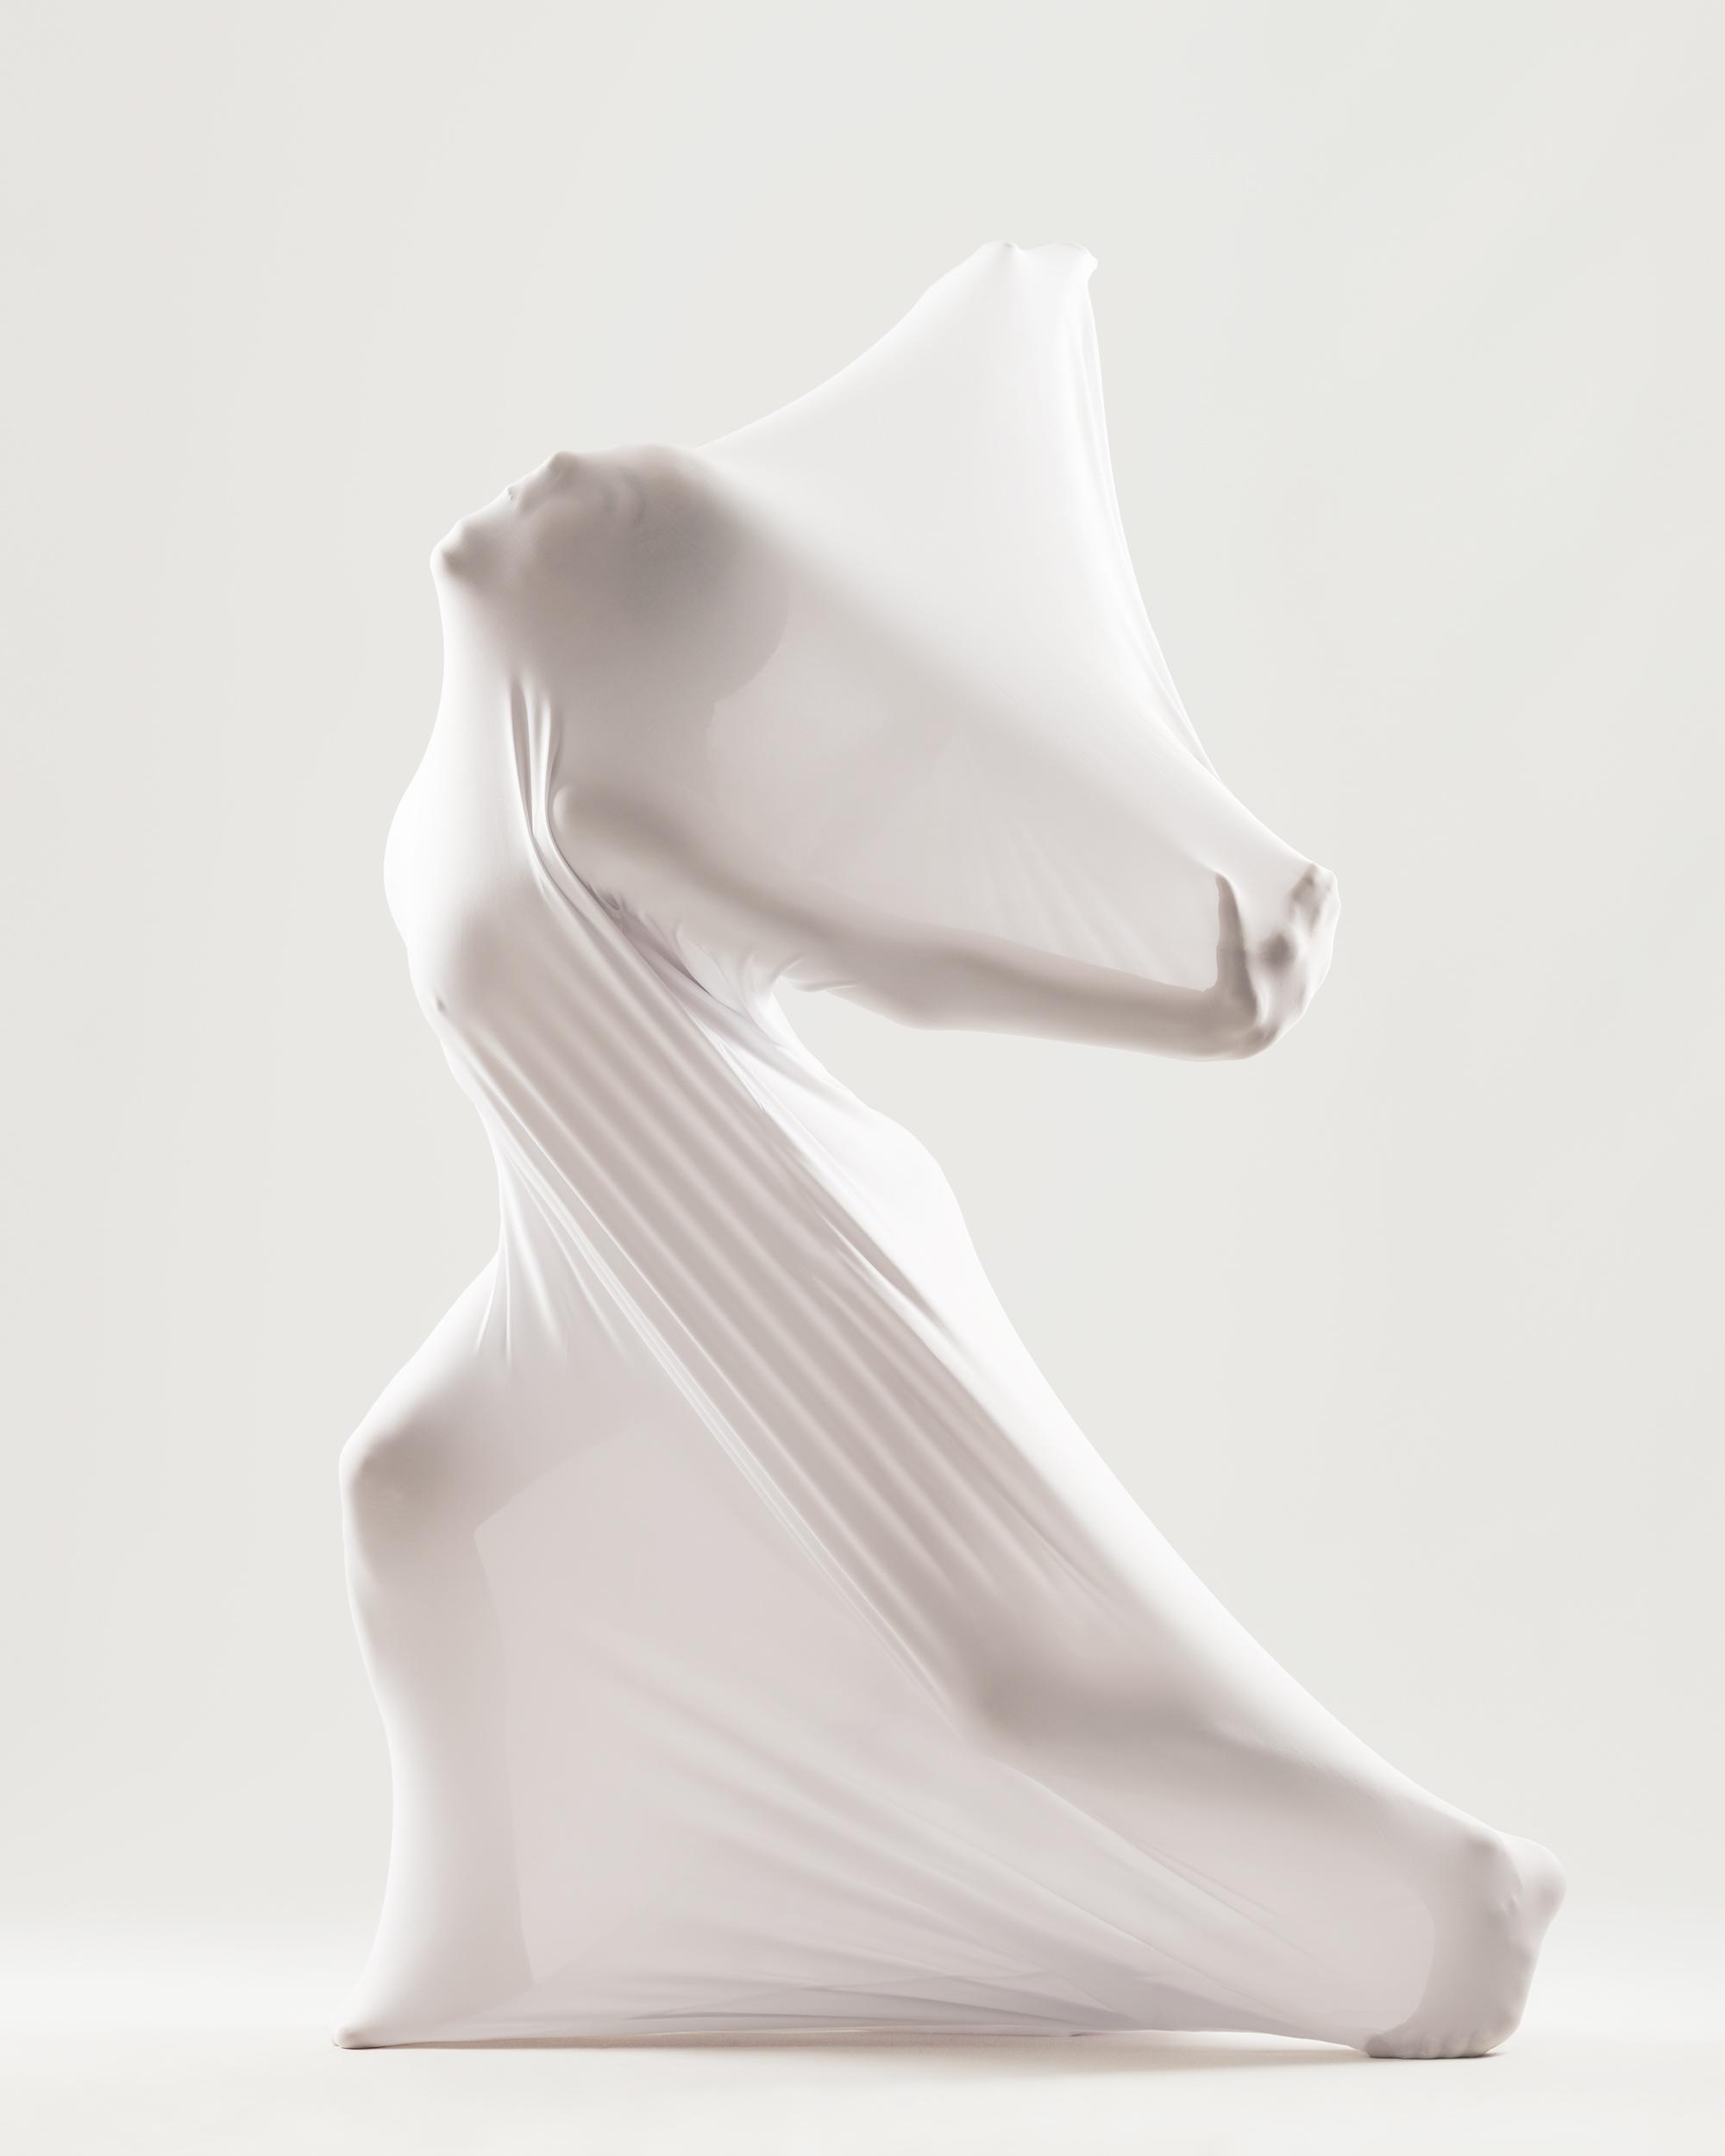 Danseres Charlotte Geeraerts